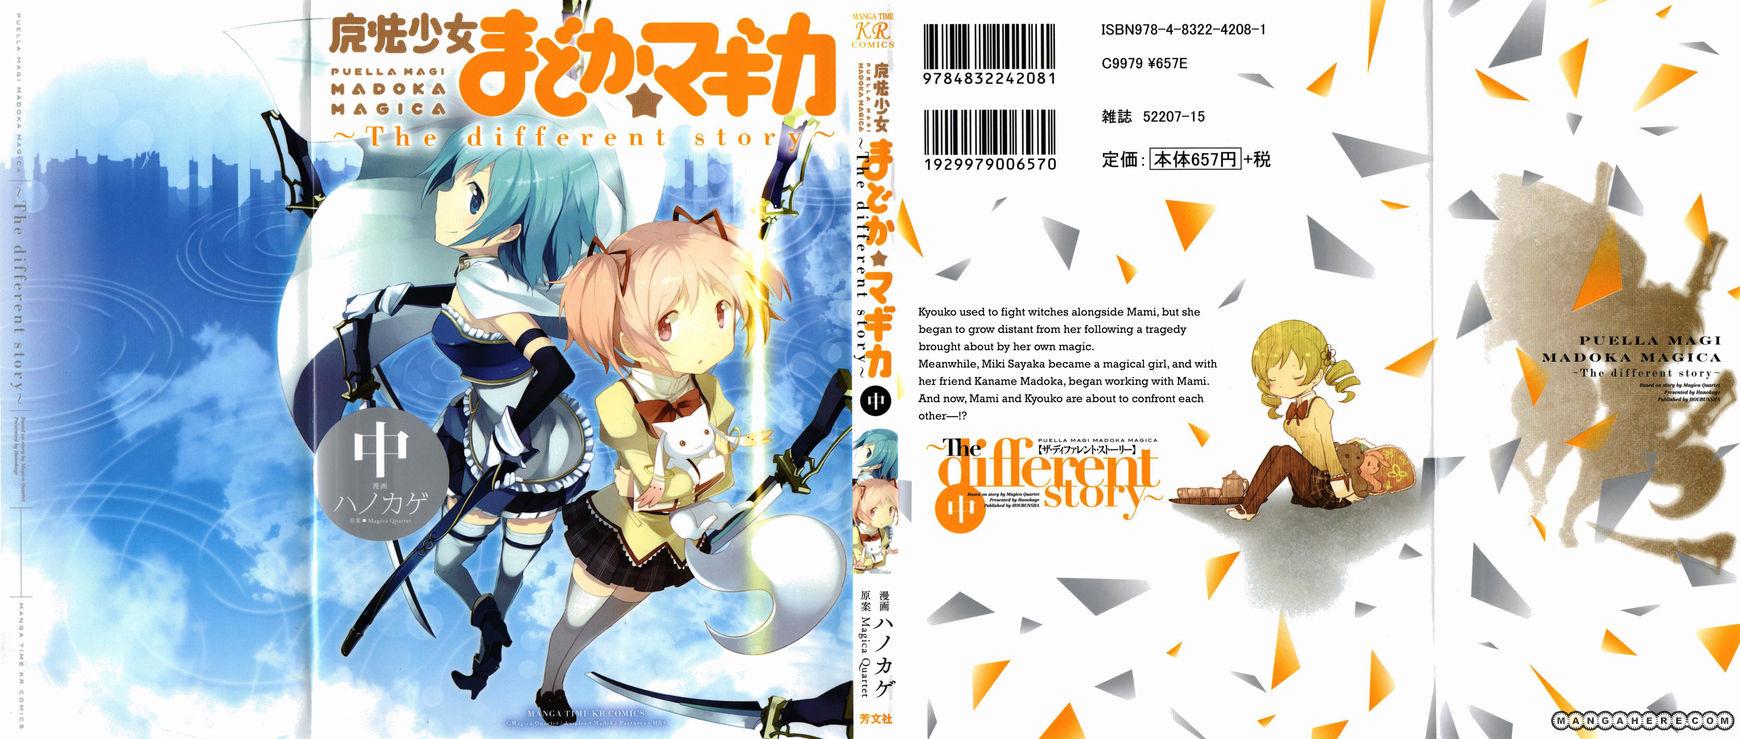 Mahou Shoujo Madoka Magica - The Different Story 5 Page 1